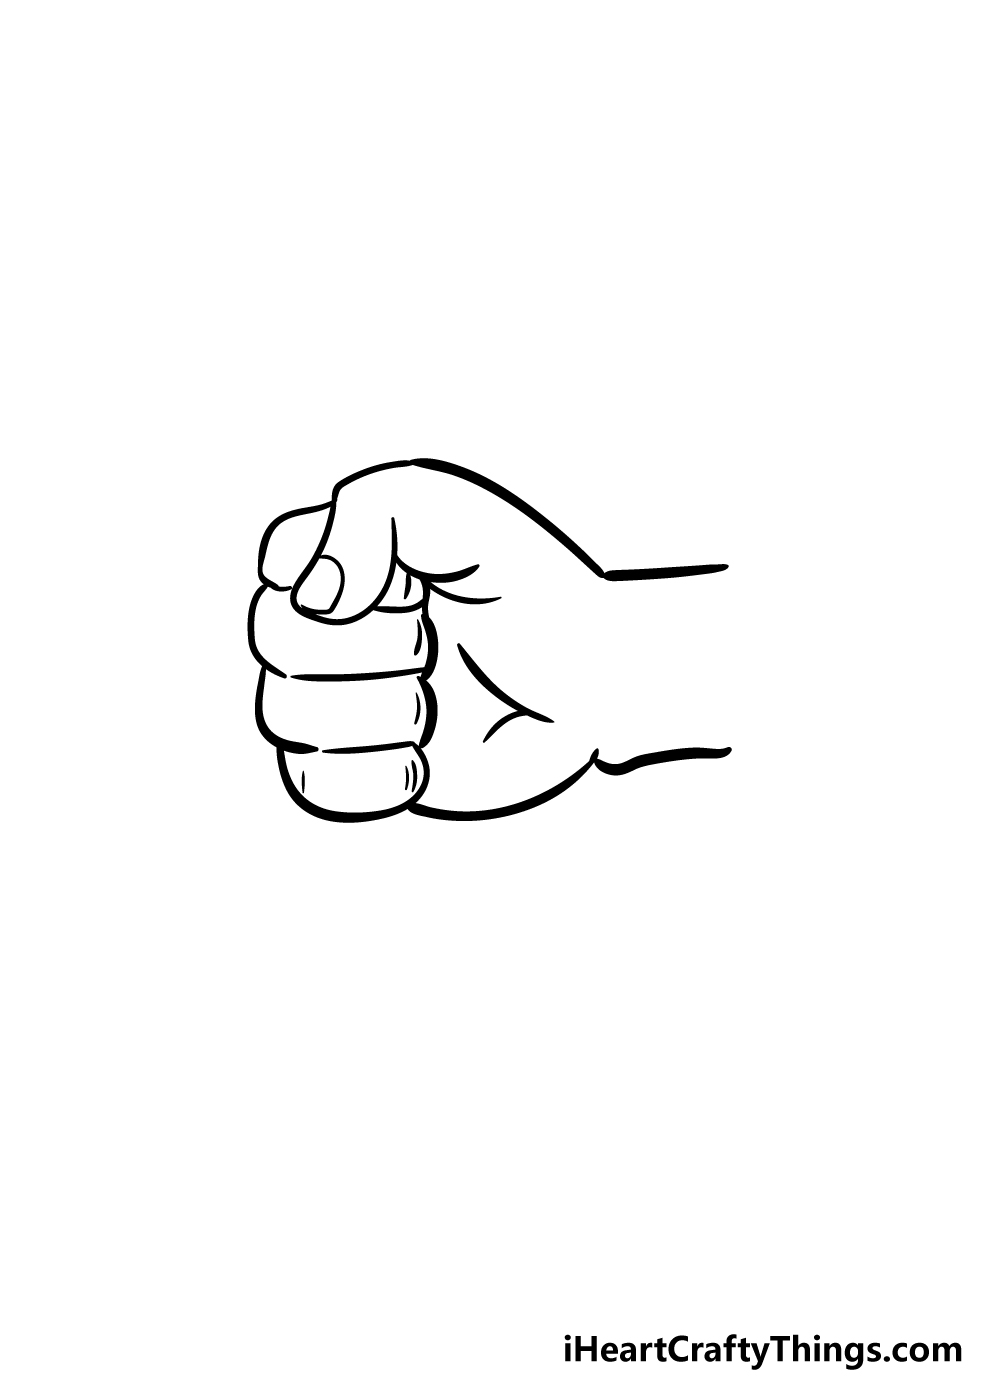 fist drawing step 5